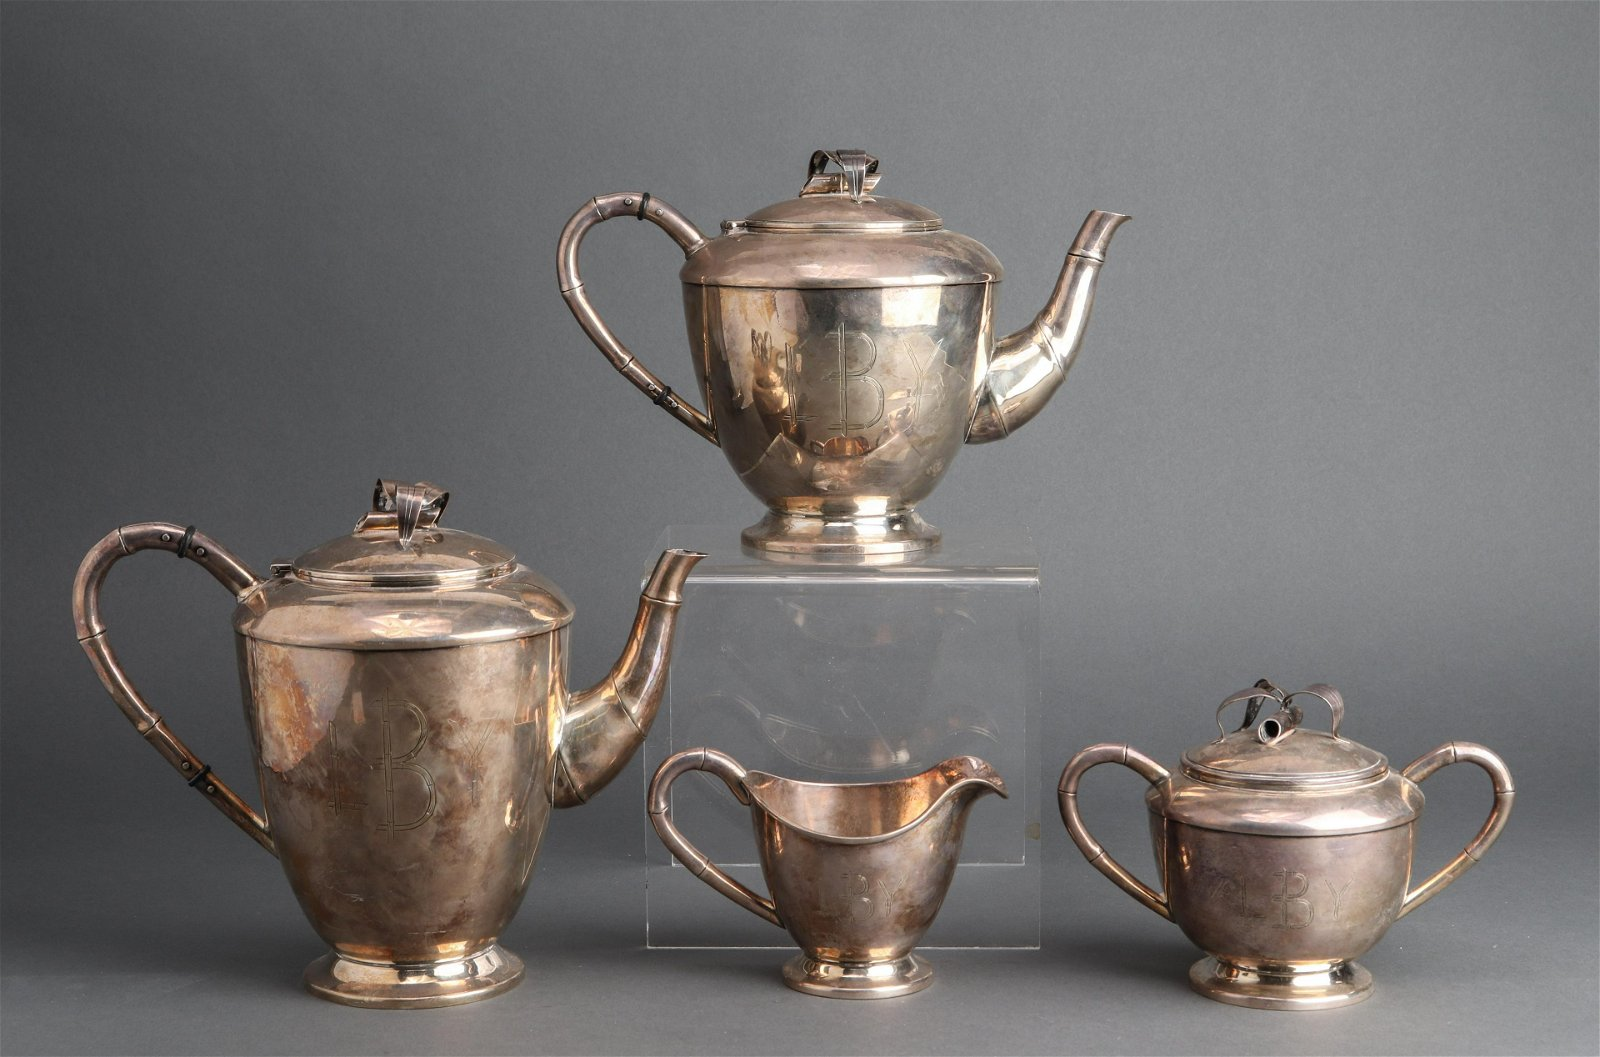 Sterling Silver Tea & Coffee Service, 4 pcs